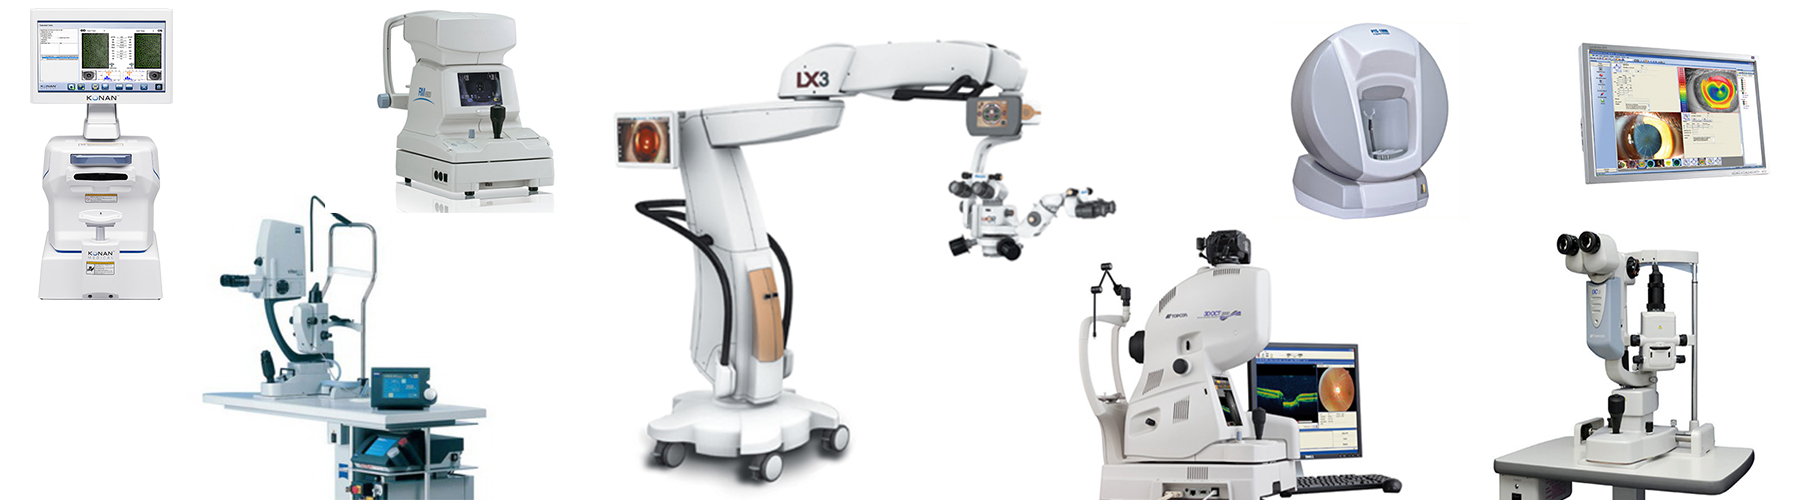 echipament oftalmic folosit